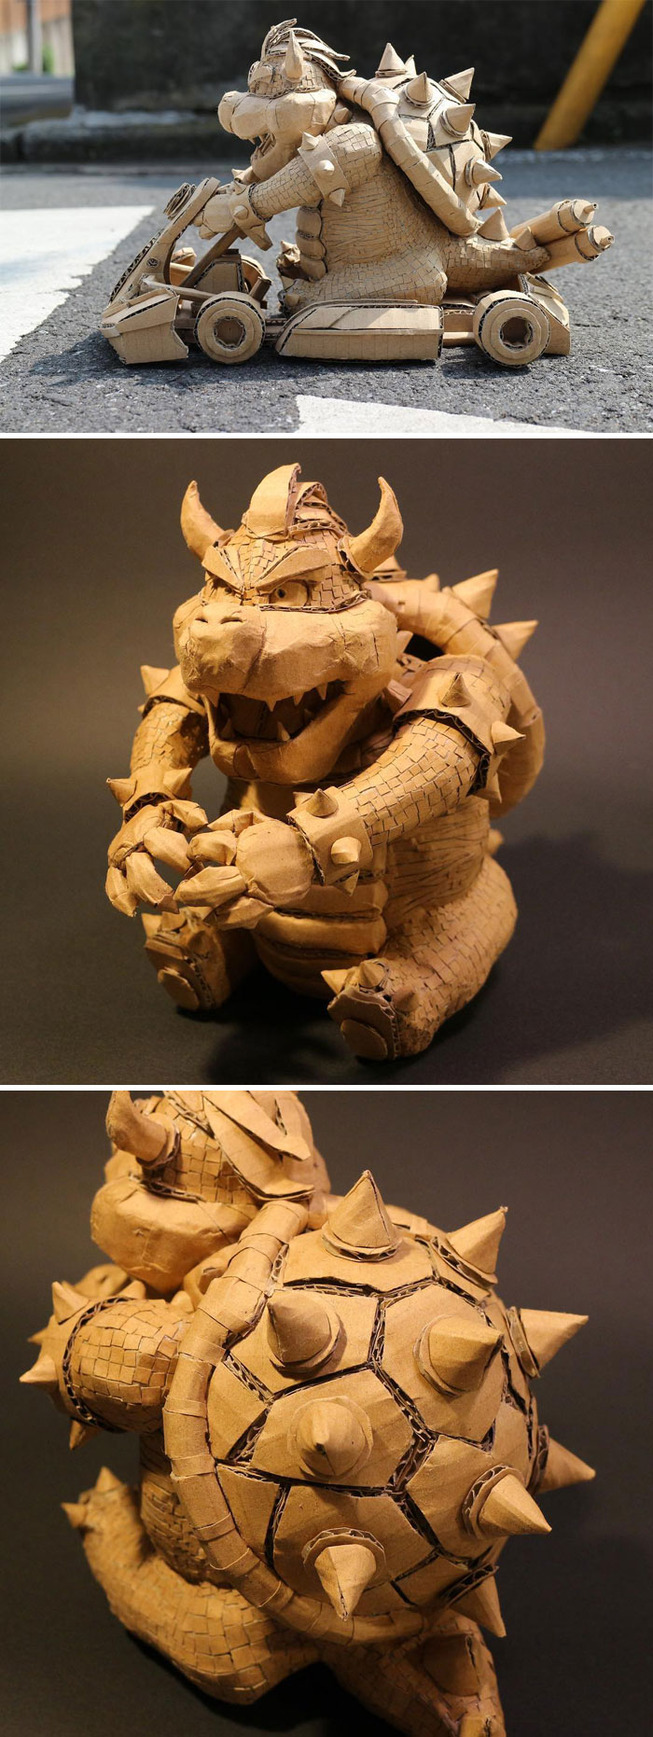 cardboard-box-art-monami-ohno-japan-1-5dbfe78f00277__700